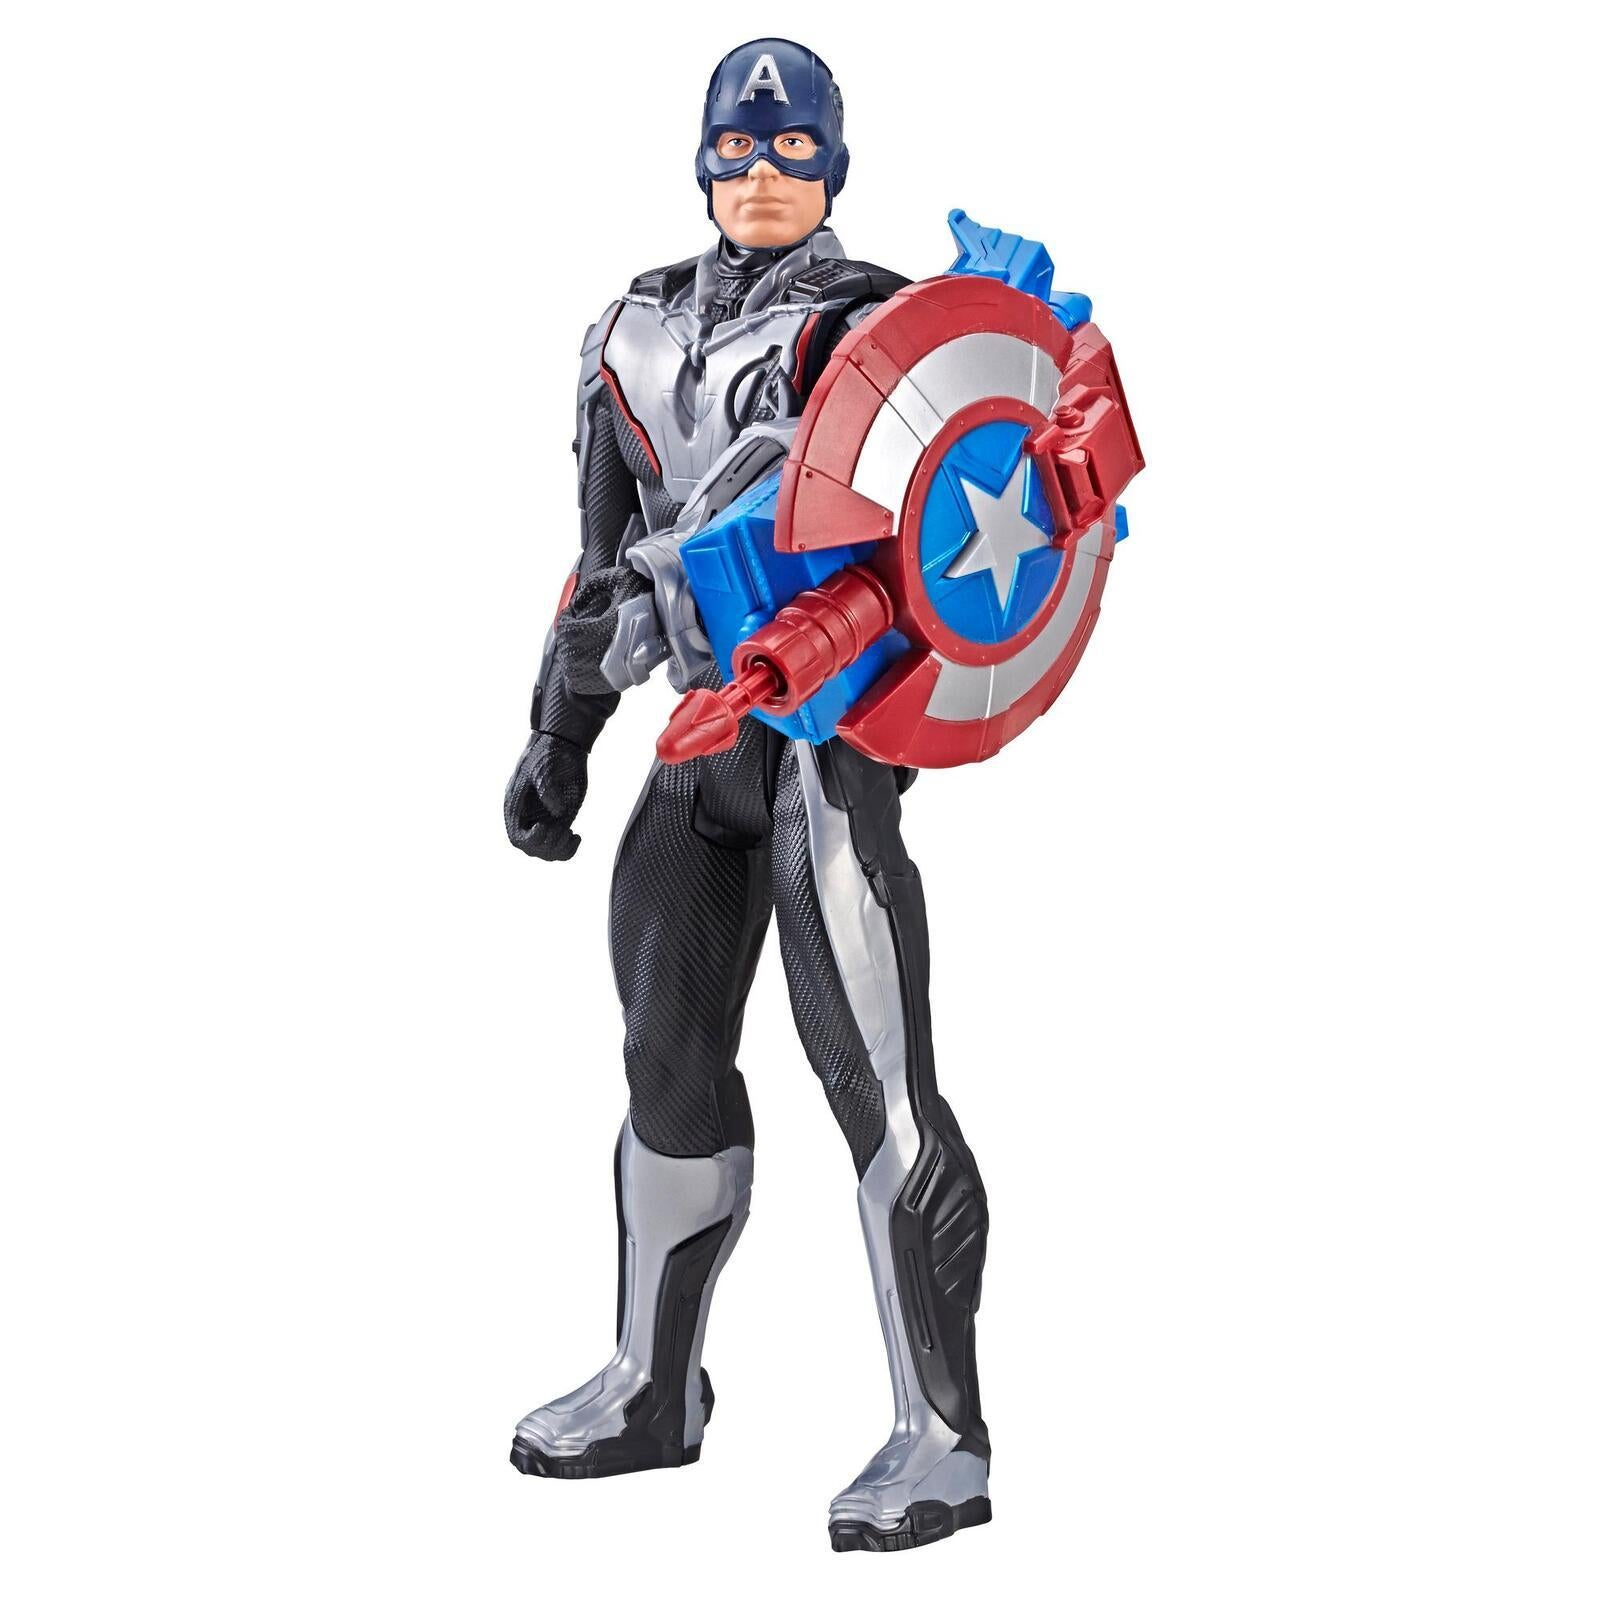 Captain America Avengers End Game Titan Hero Power figure toy AU 30cm tall Soun